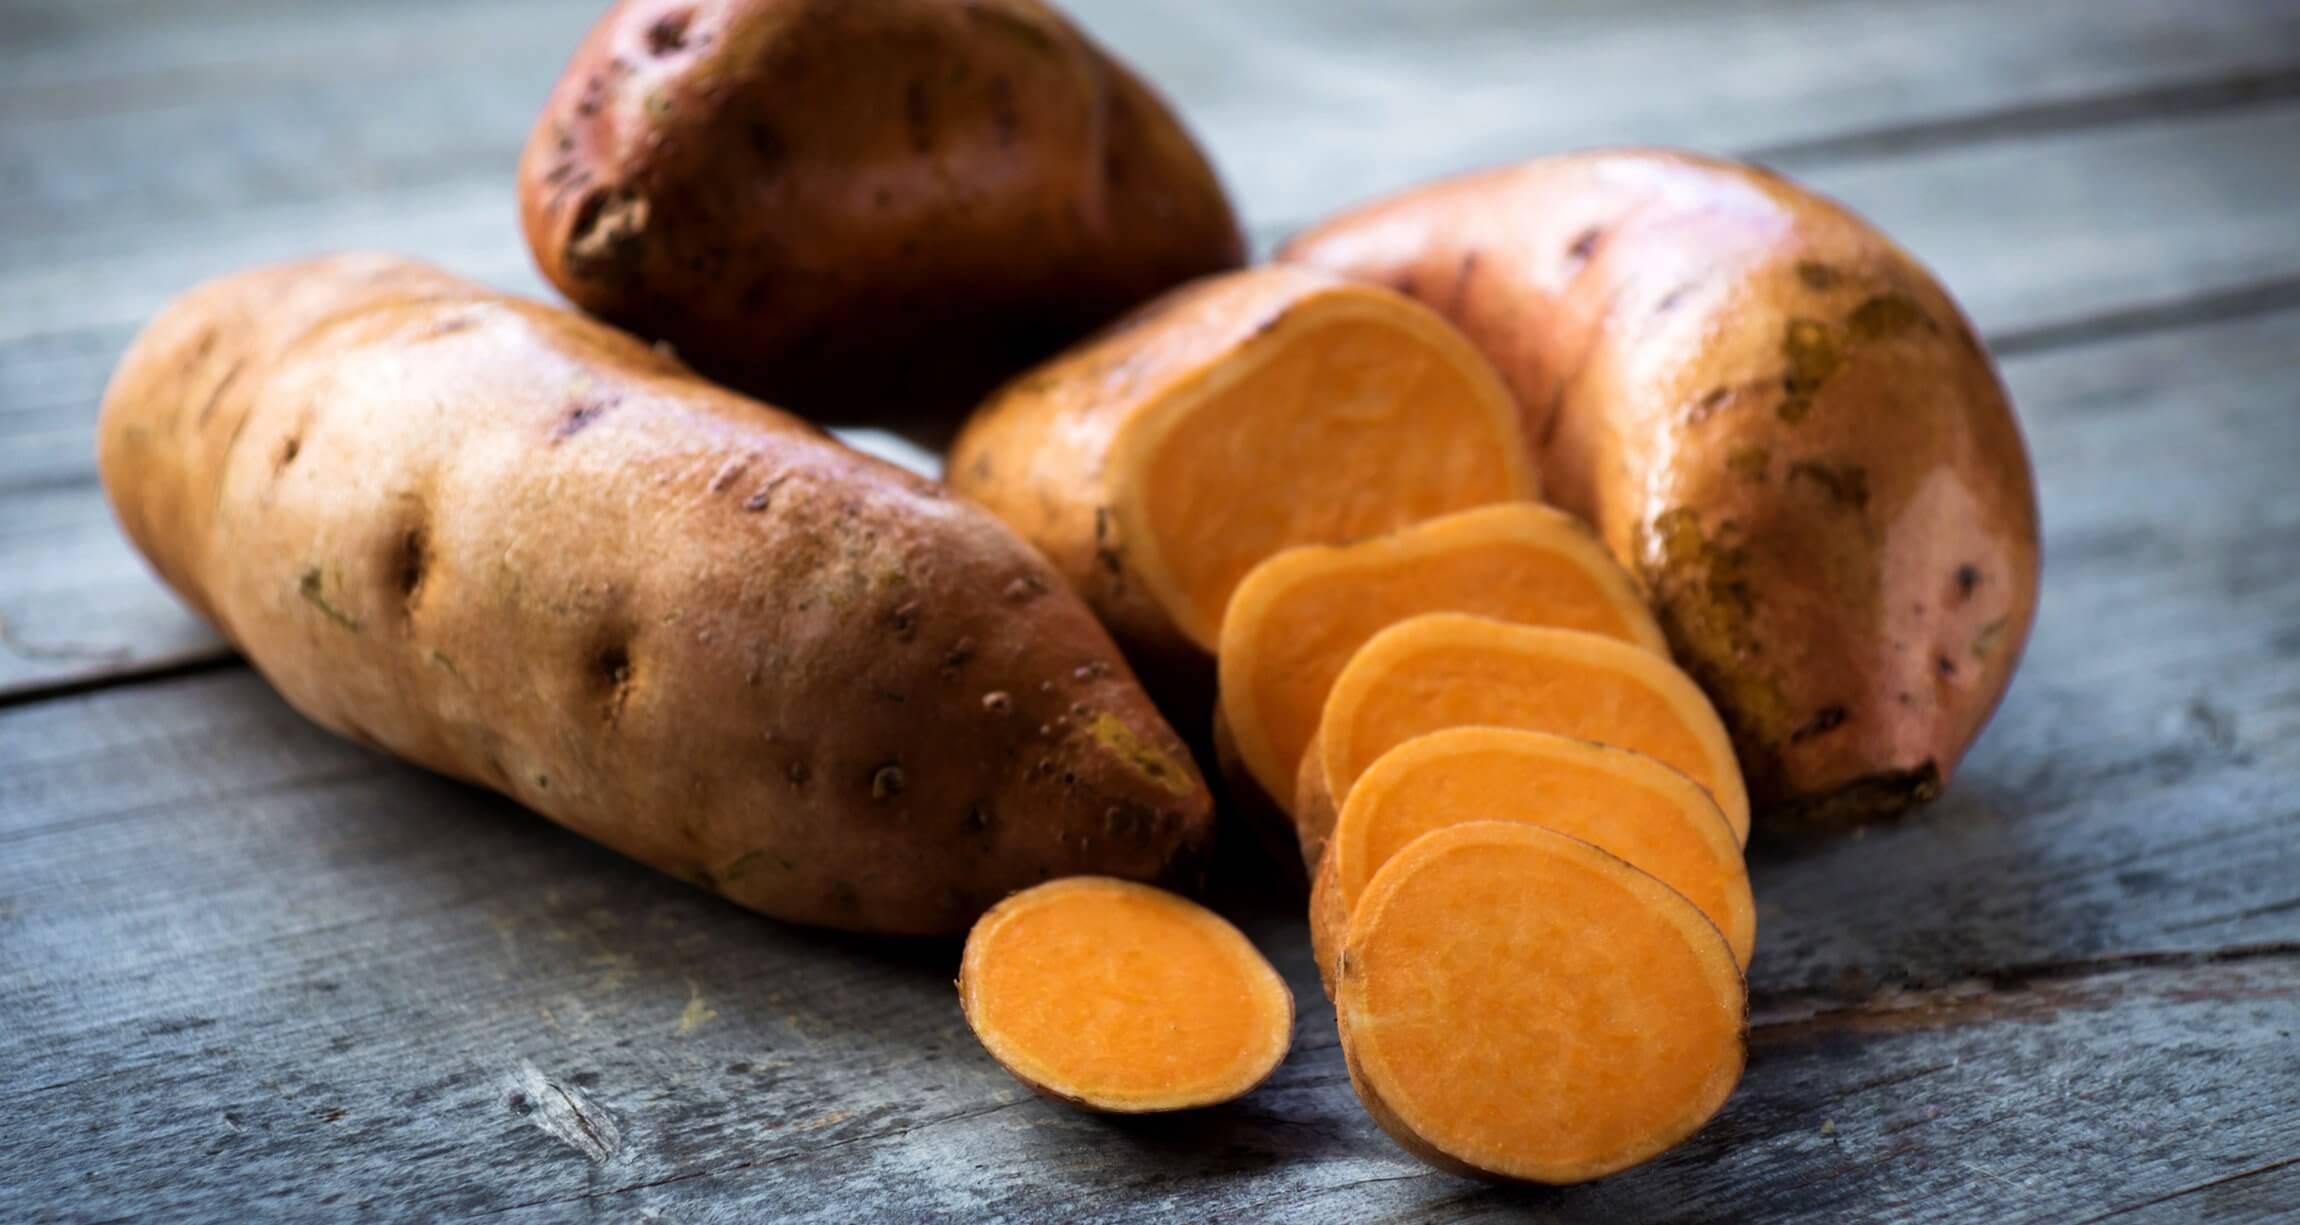 Foods To Avoid in Keto Diet: Sweet Potato